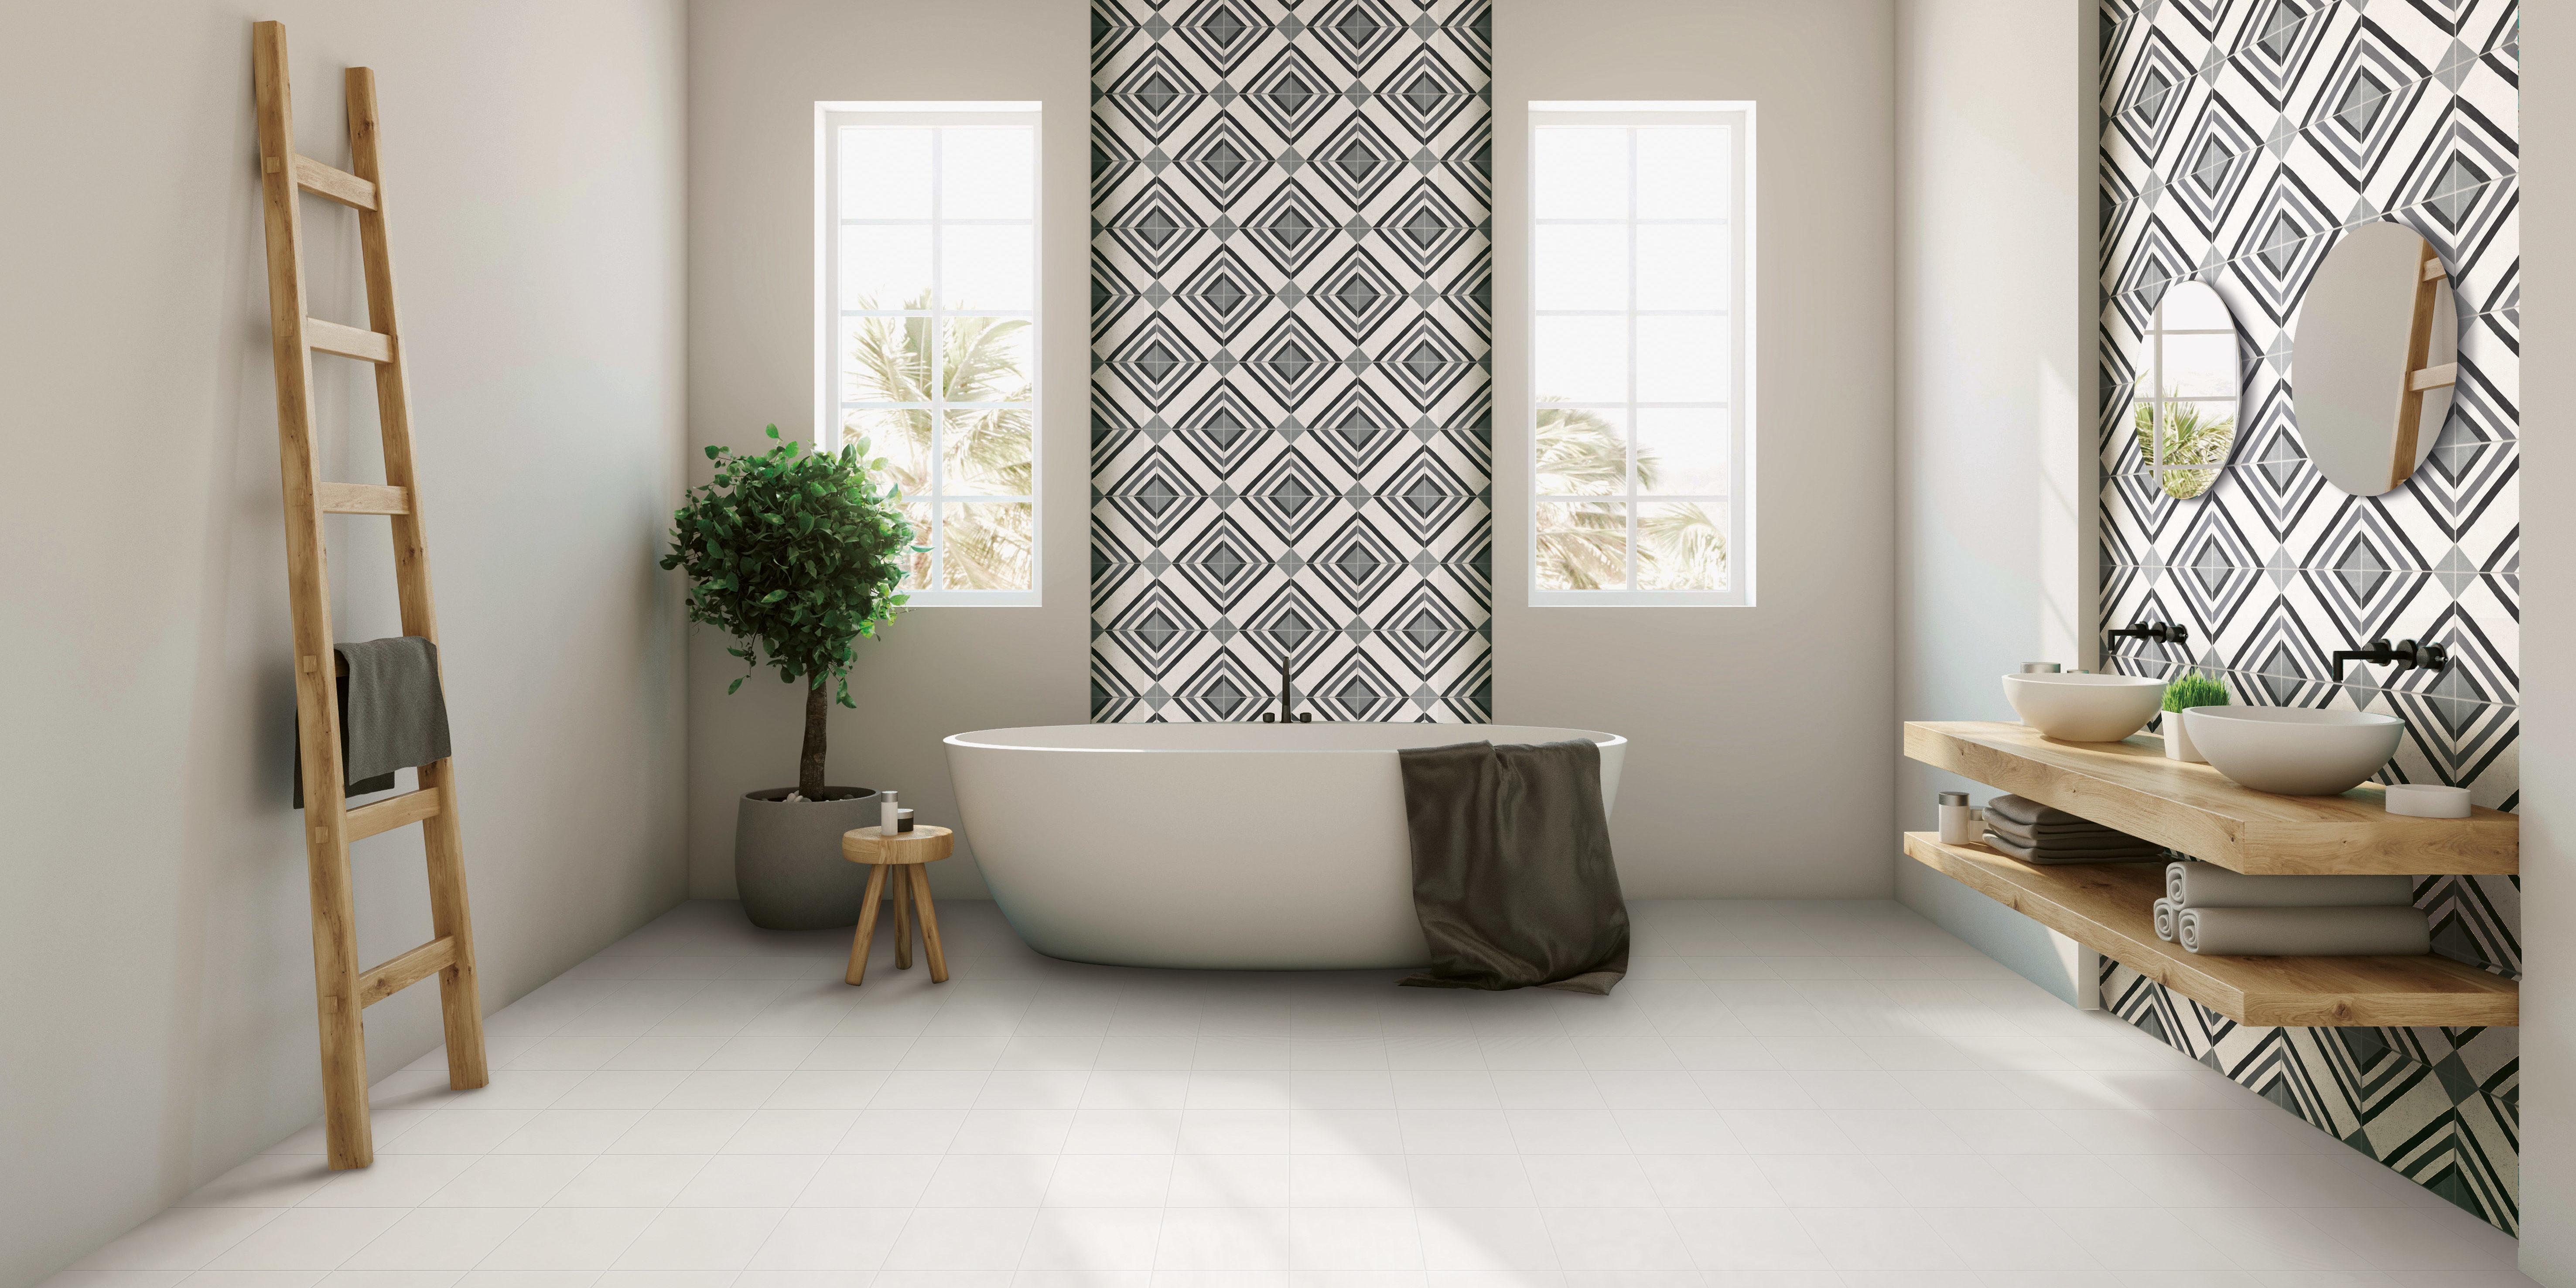 emc tiles patterned wall tiles scandinavian spa bathroom trend